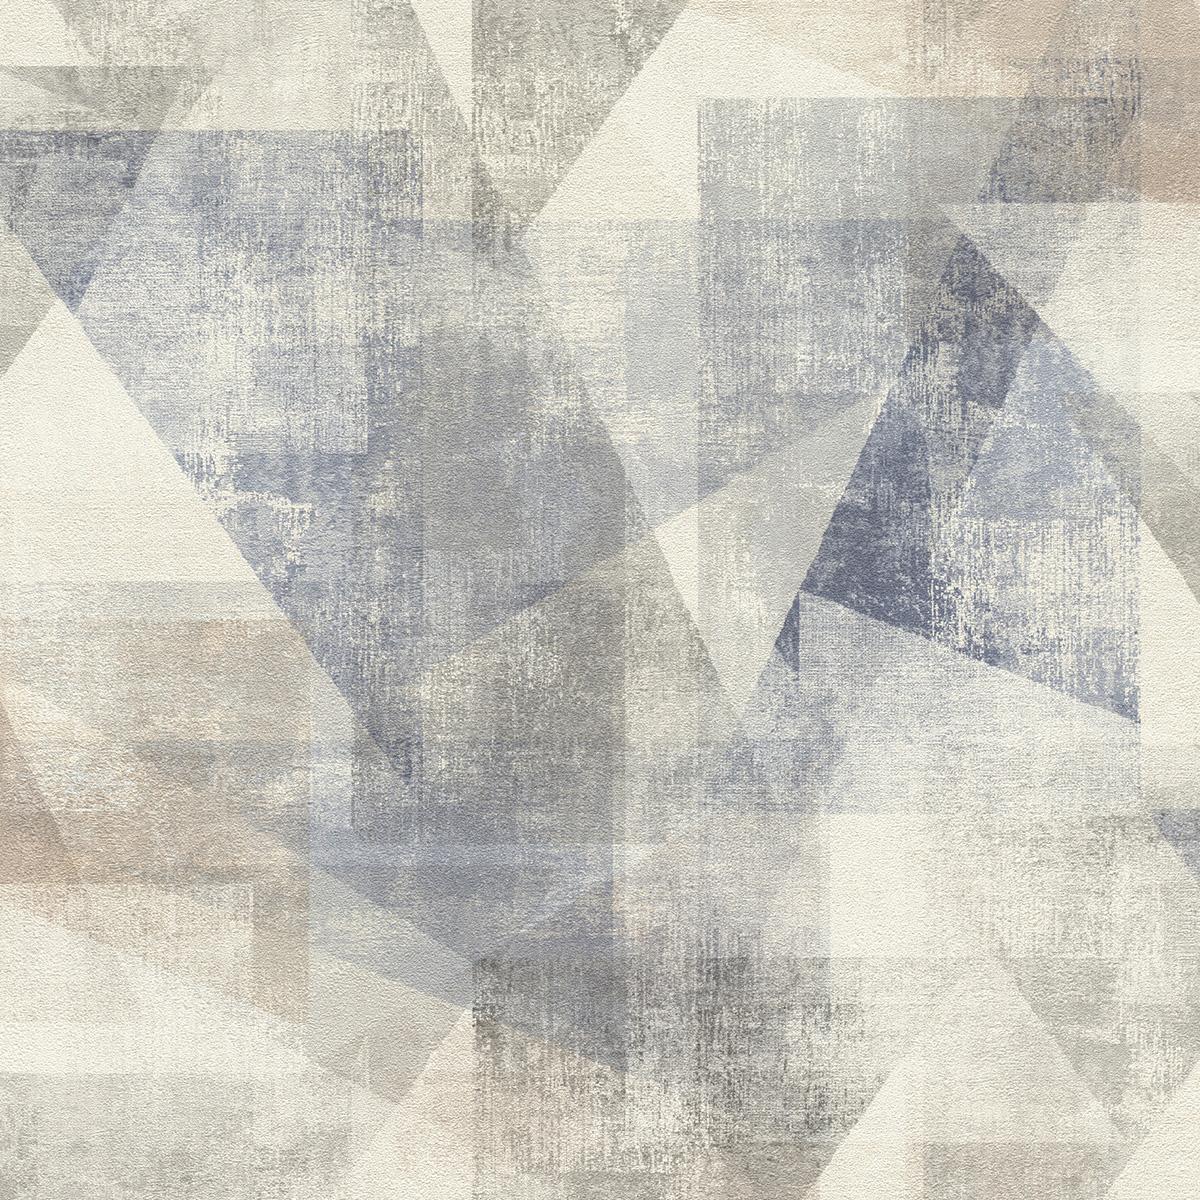 Тапет Инспирейшън 2 цветни абстрактни триъгълници сиво